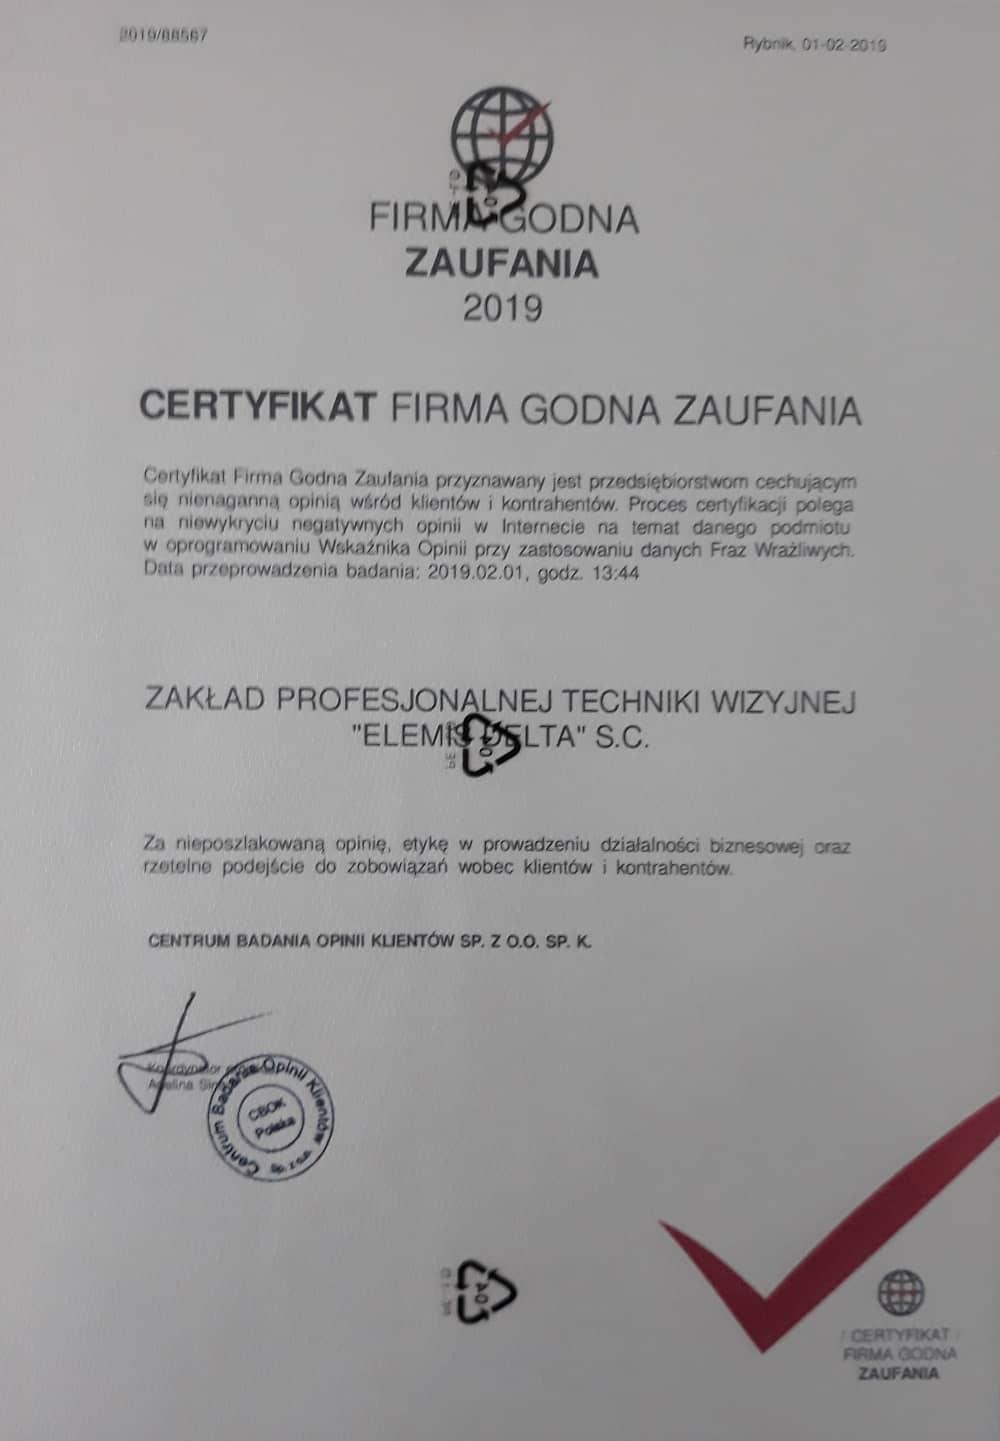 certyfikat1-elemis-delta (1)